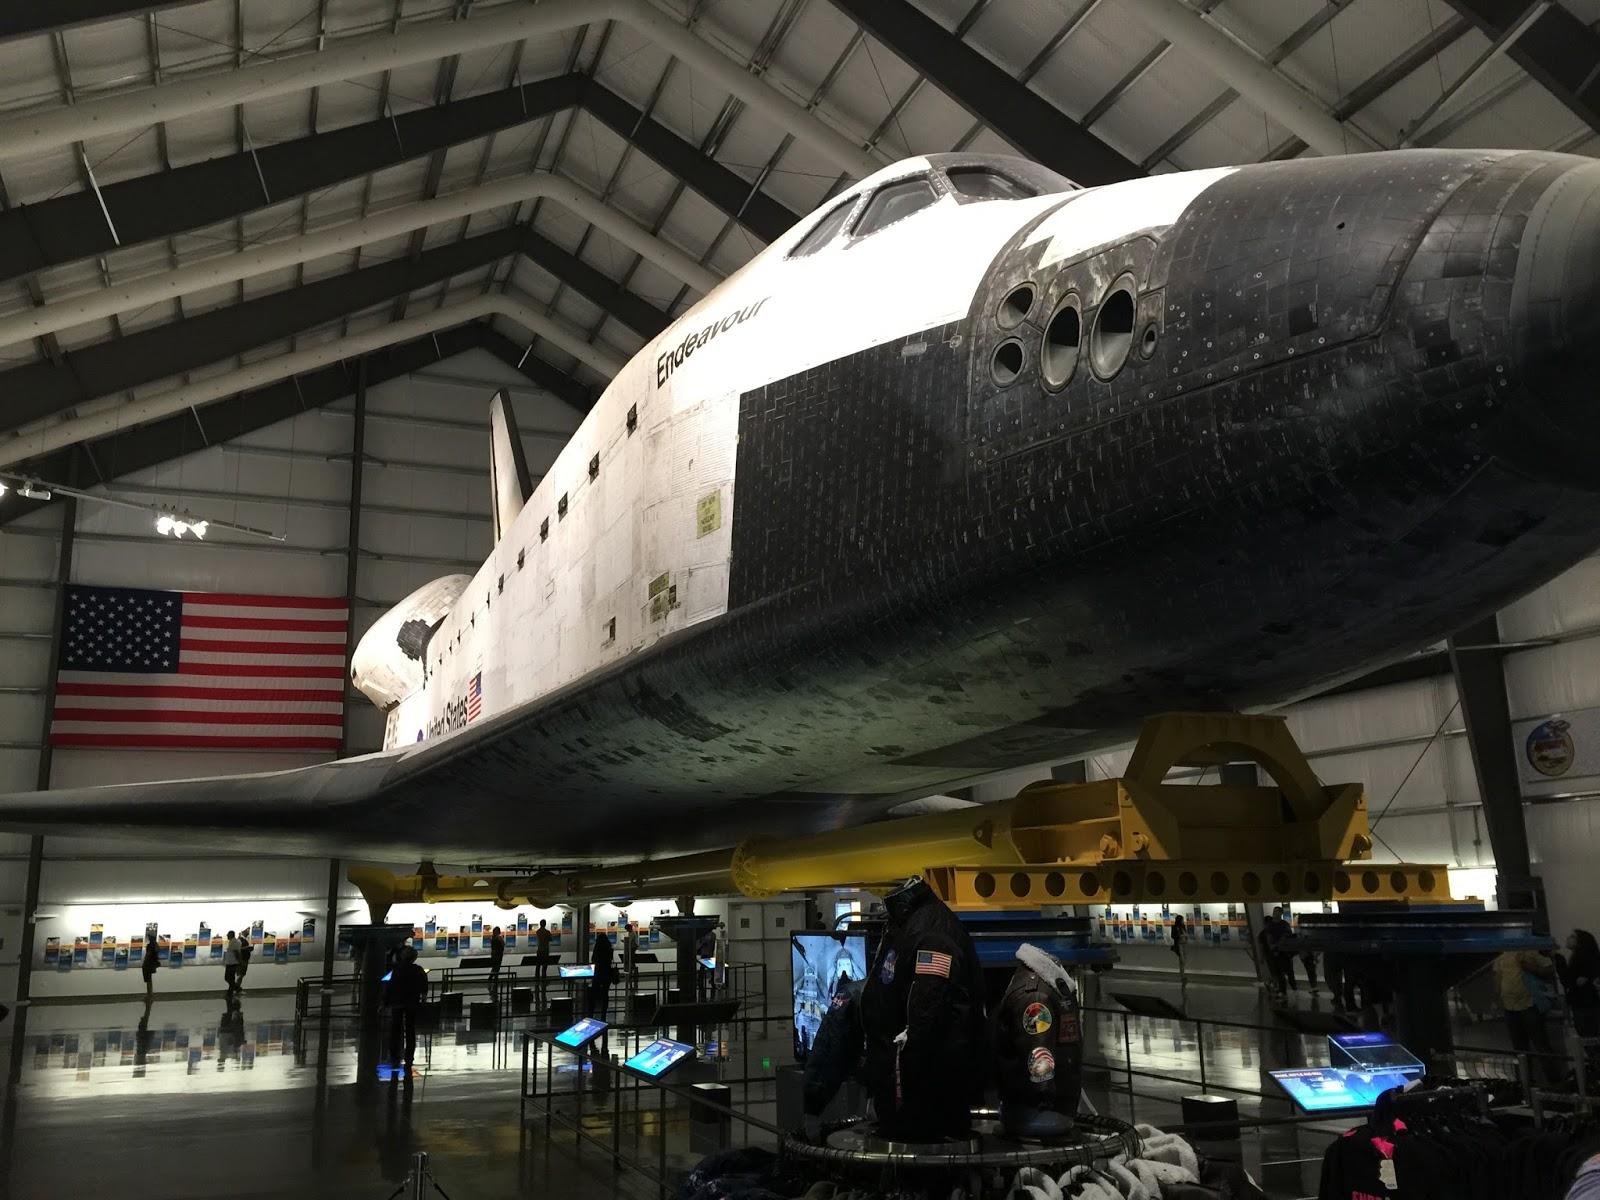 space shuttle endeavour california science center - photo #22